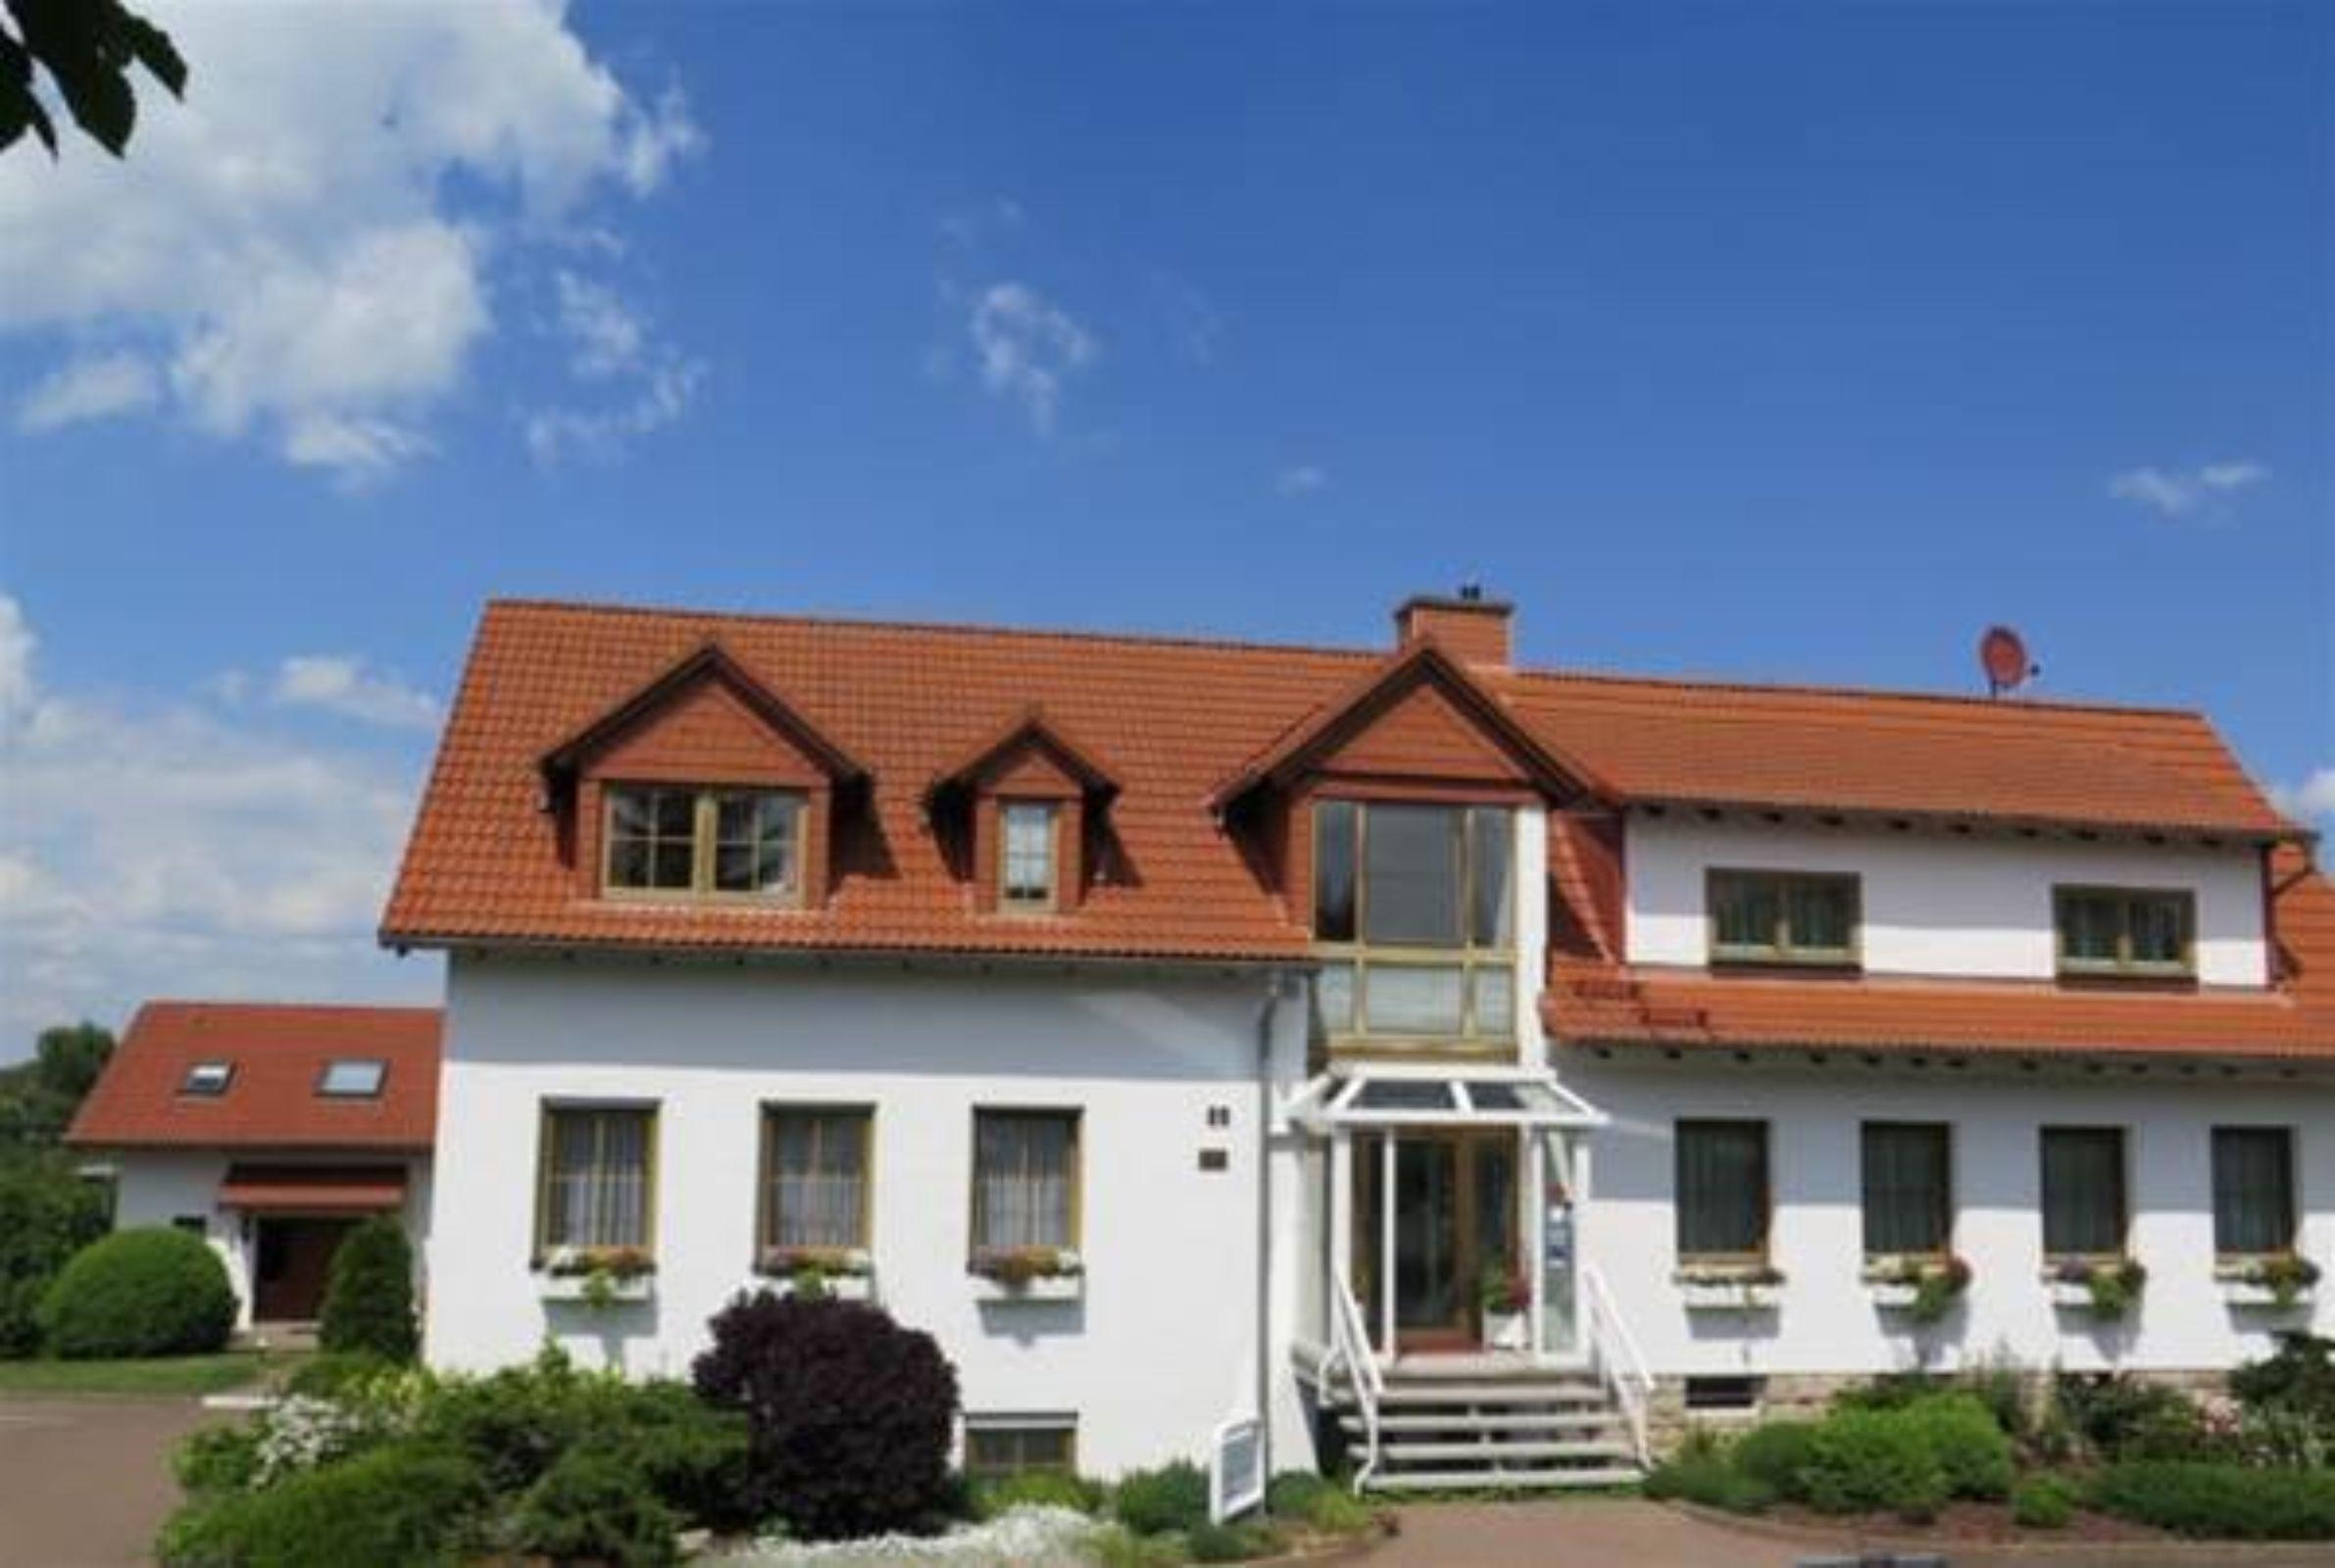 Hotel Erfurtblick, Erfurt